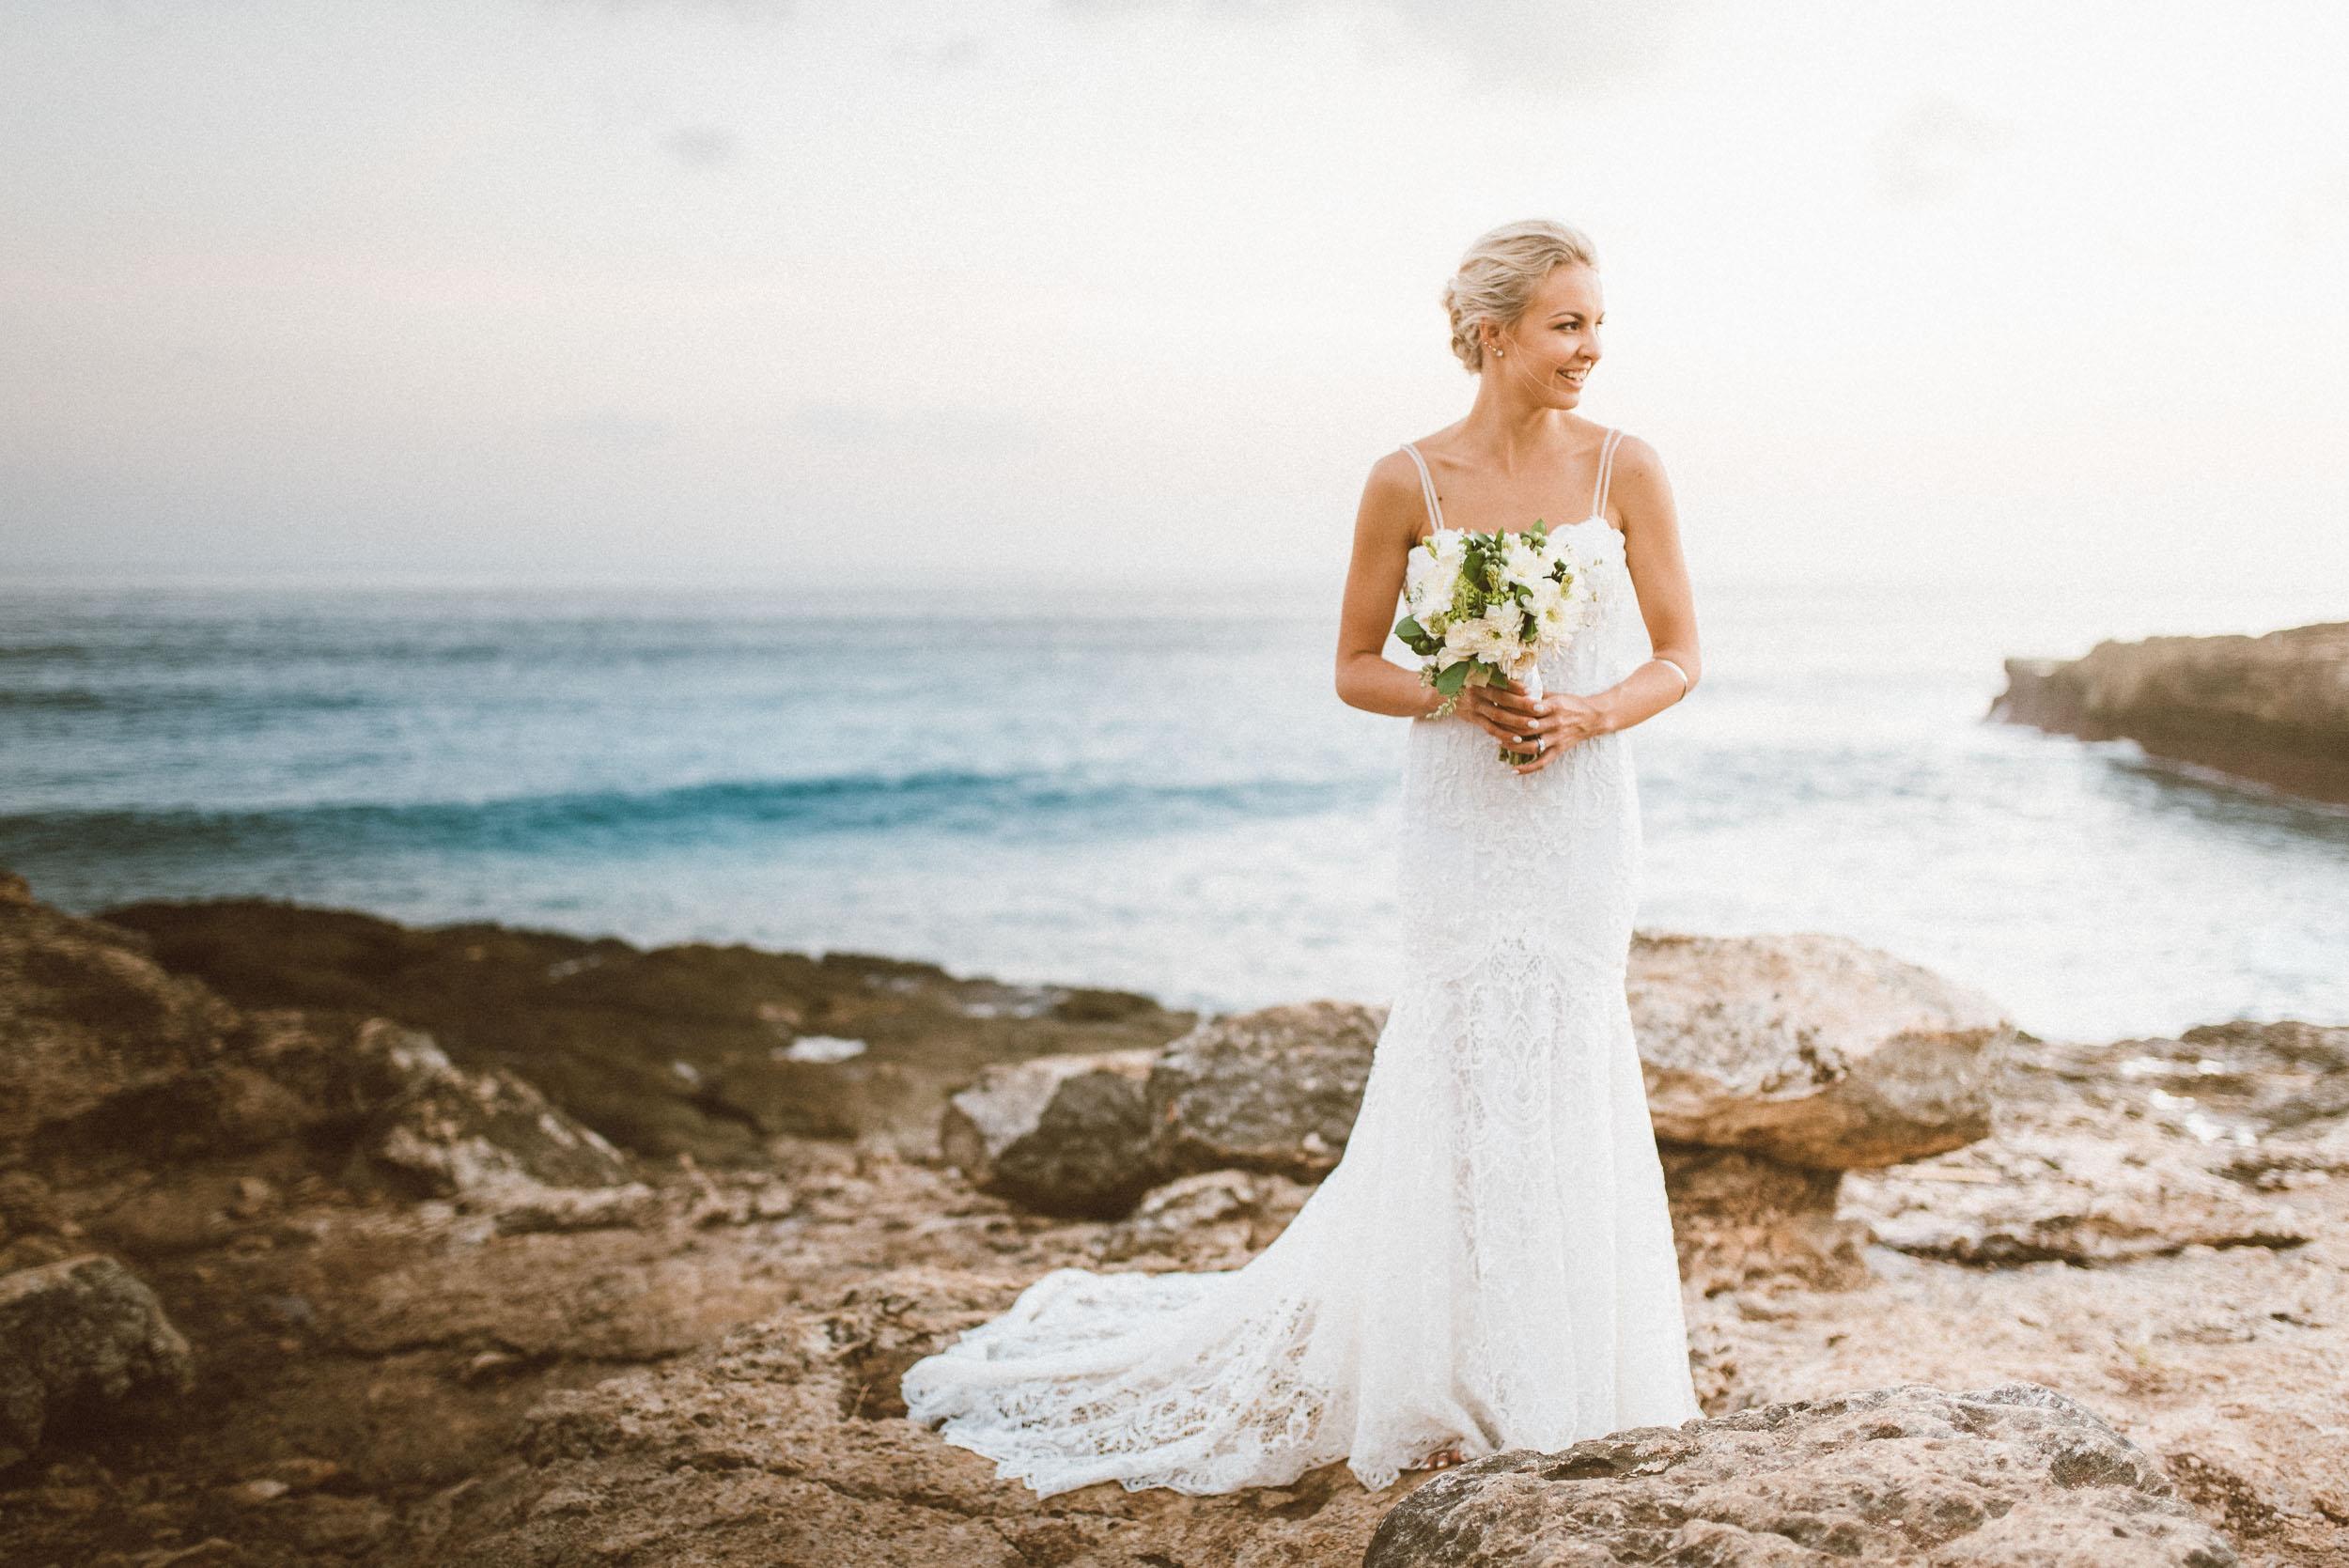 The Raw Photographer - Cairns Wedding Photographer - Bali Ubud Destination Photography - Travel - Australia - Asia Wed Photo Portrait-13.jpg